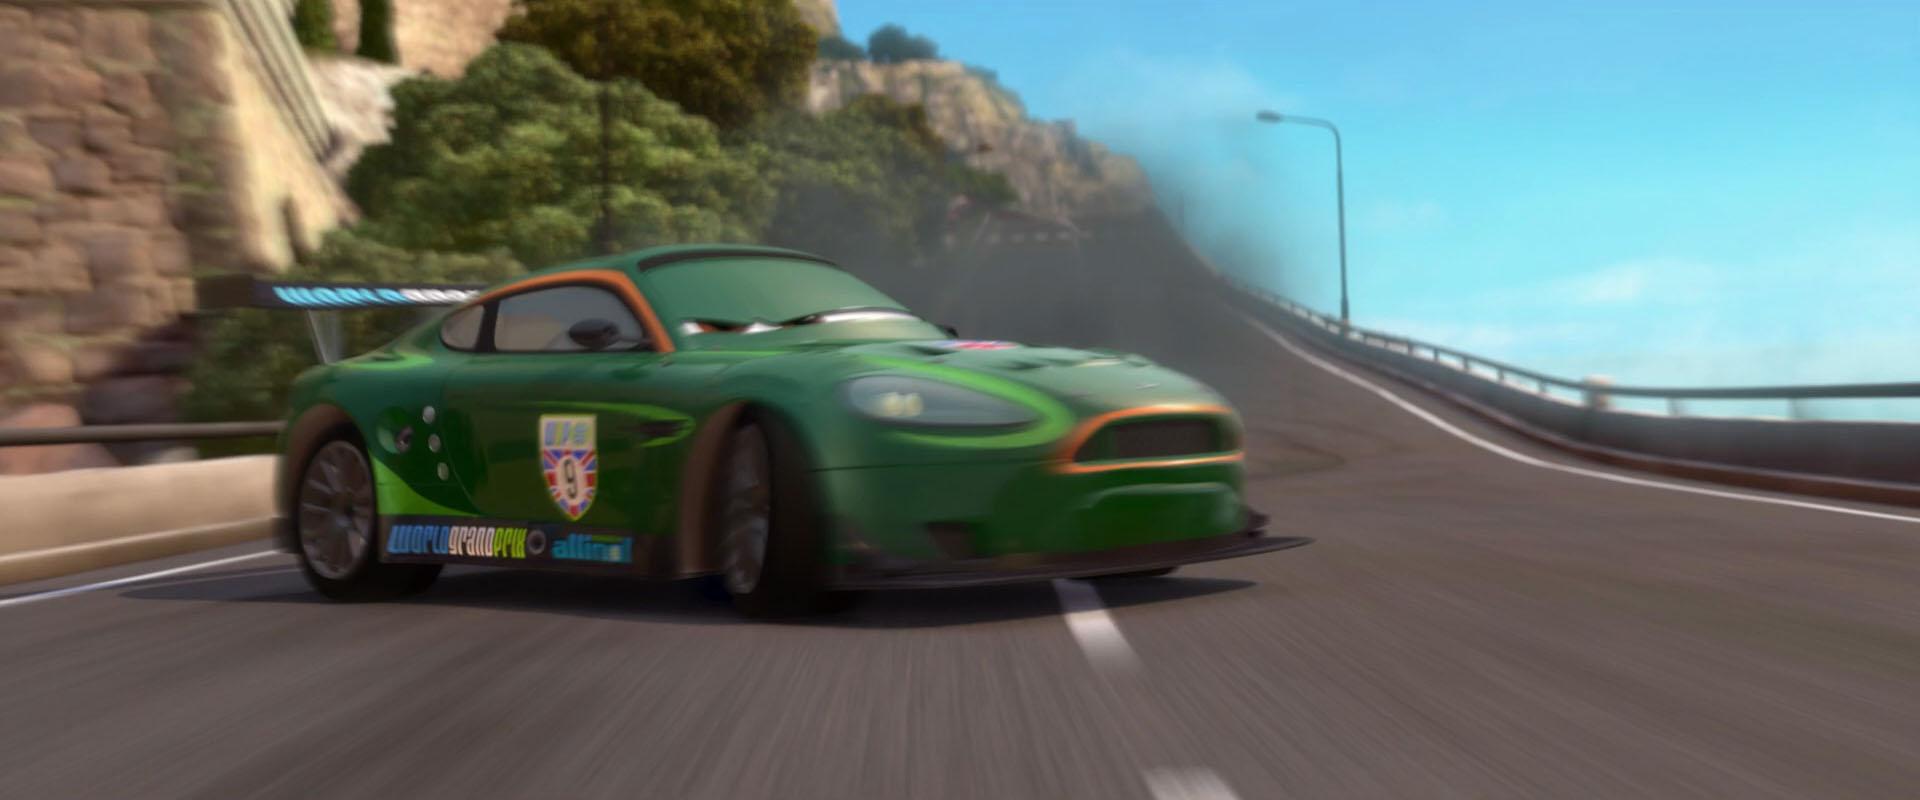 nigel-gearsley-personnage-cars-2-03